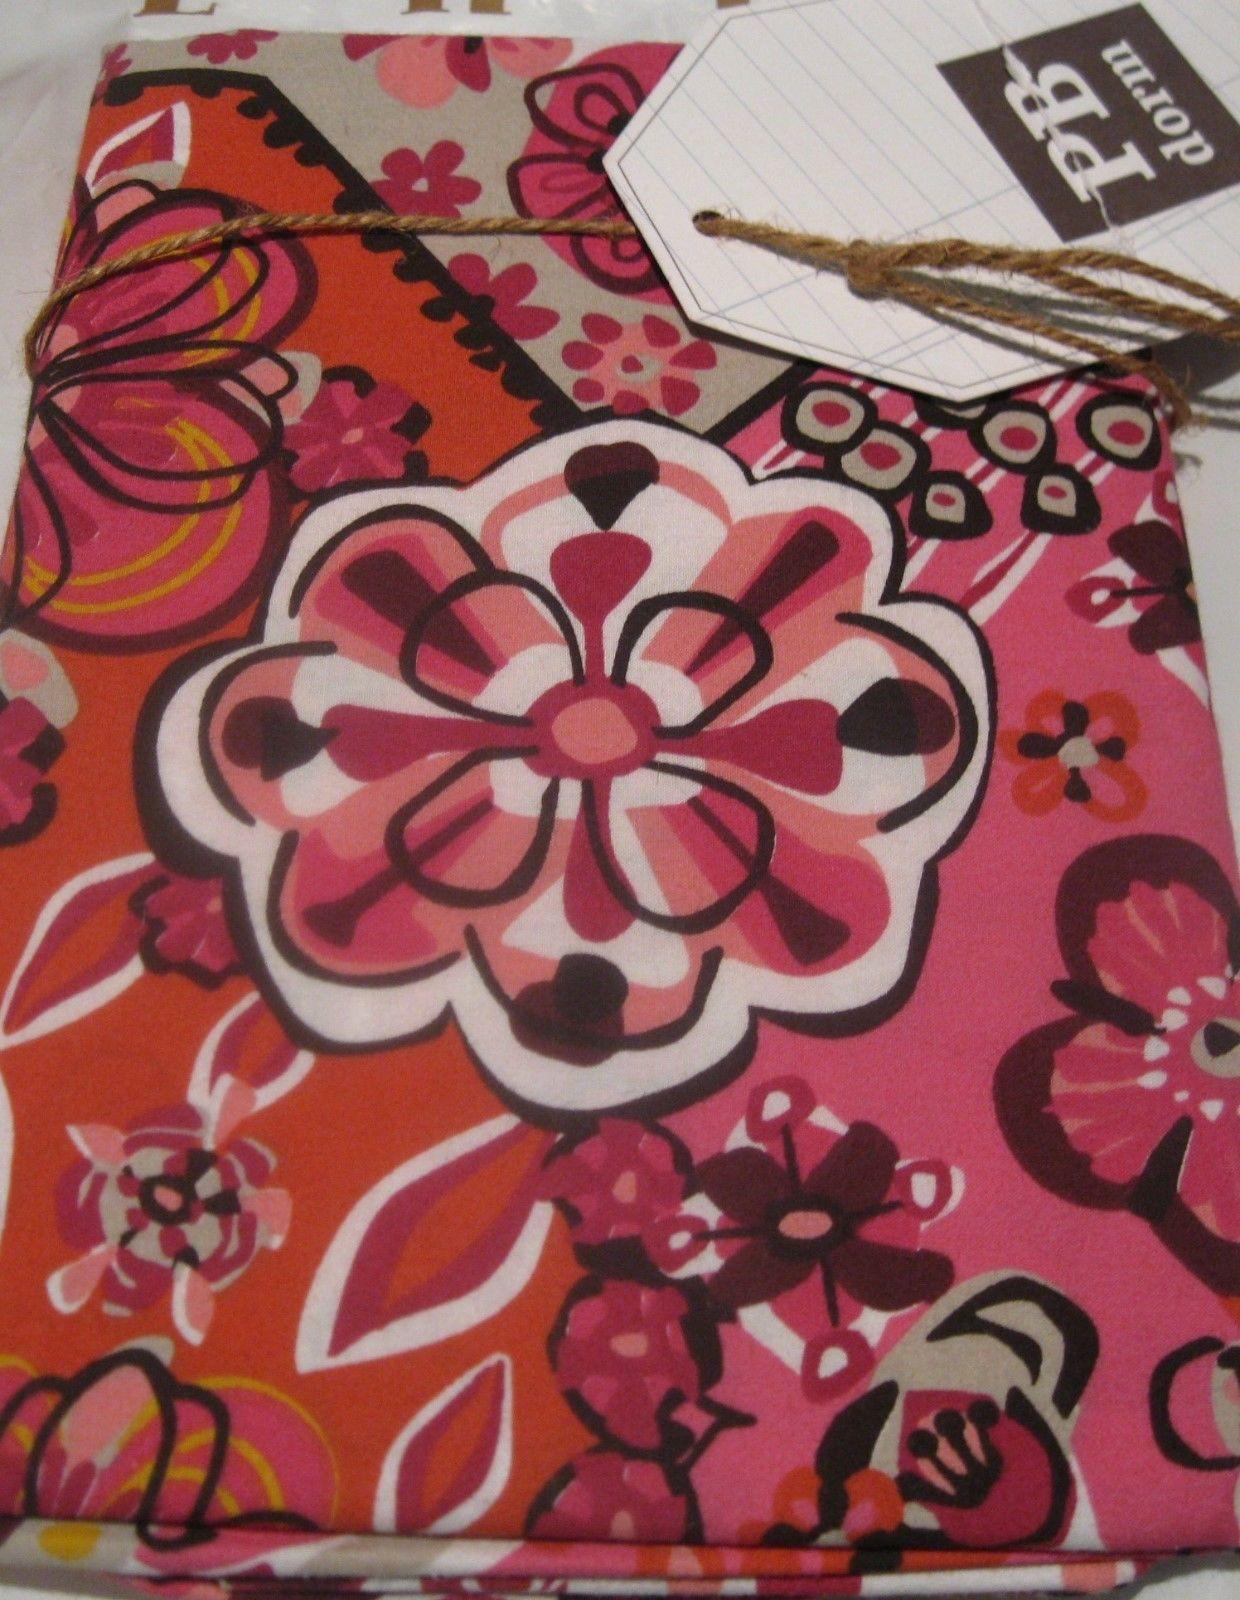 2 Pottery Barn Lucia Mosaic Tile Standard Pillow Shams 26x20 Pink Magenta Brown